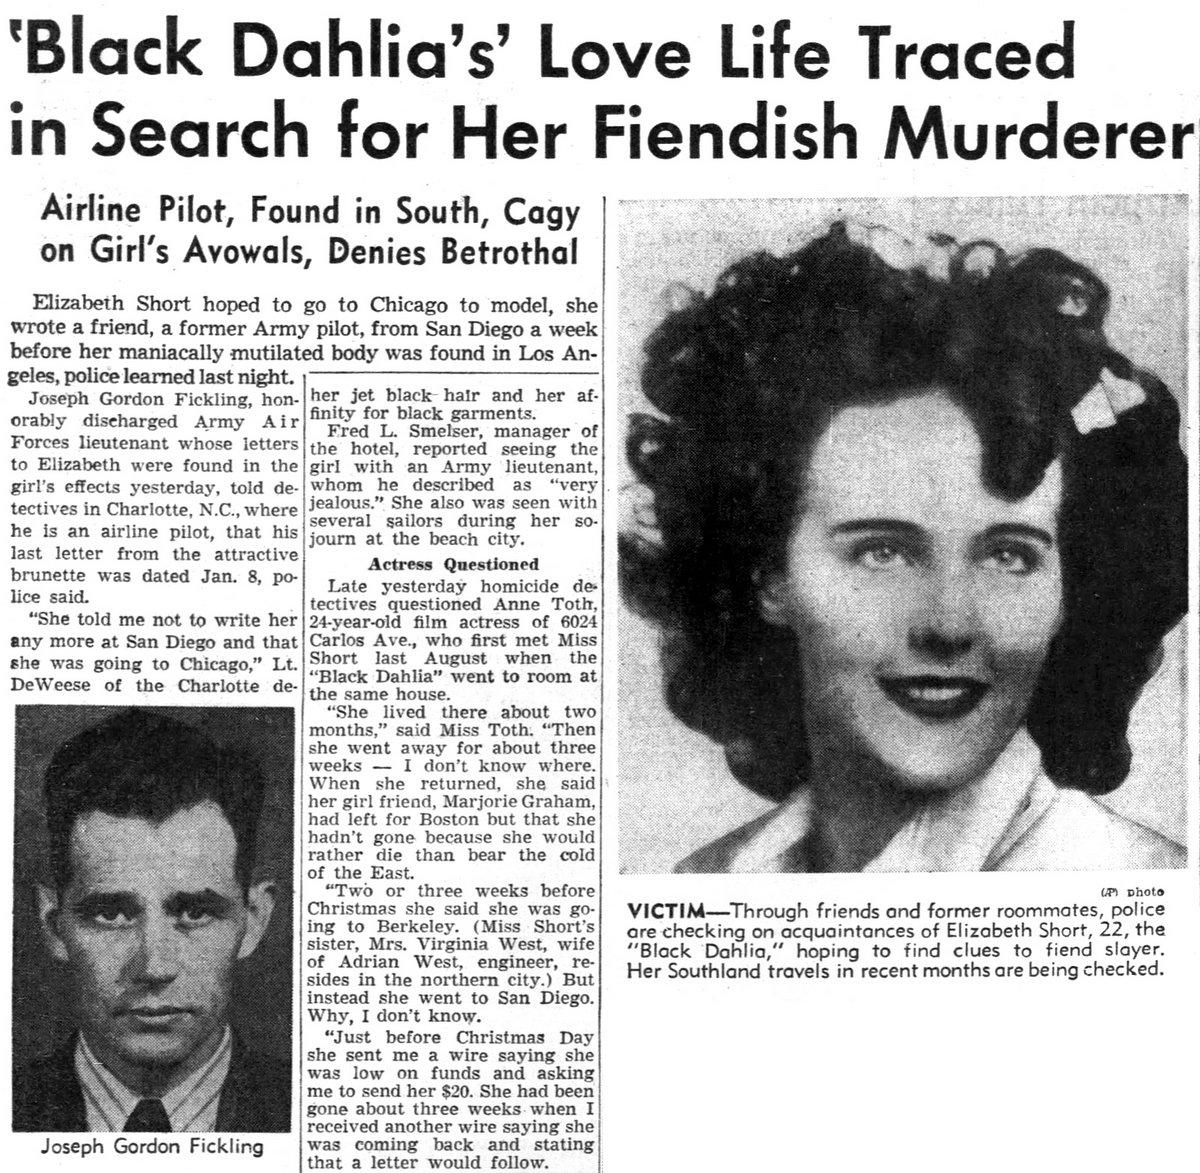 Dahlia love life traced news story - January 1947